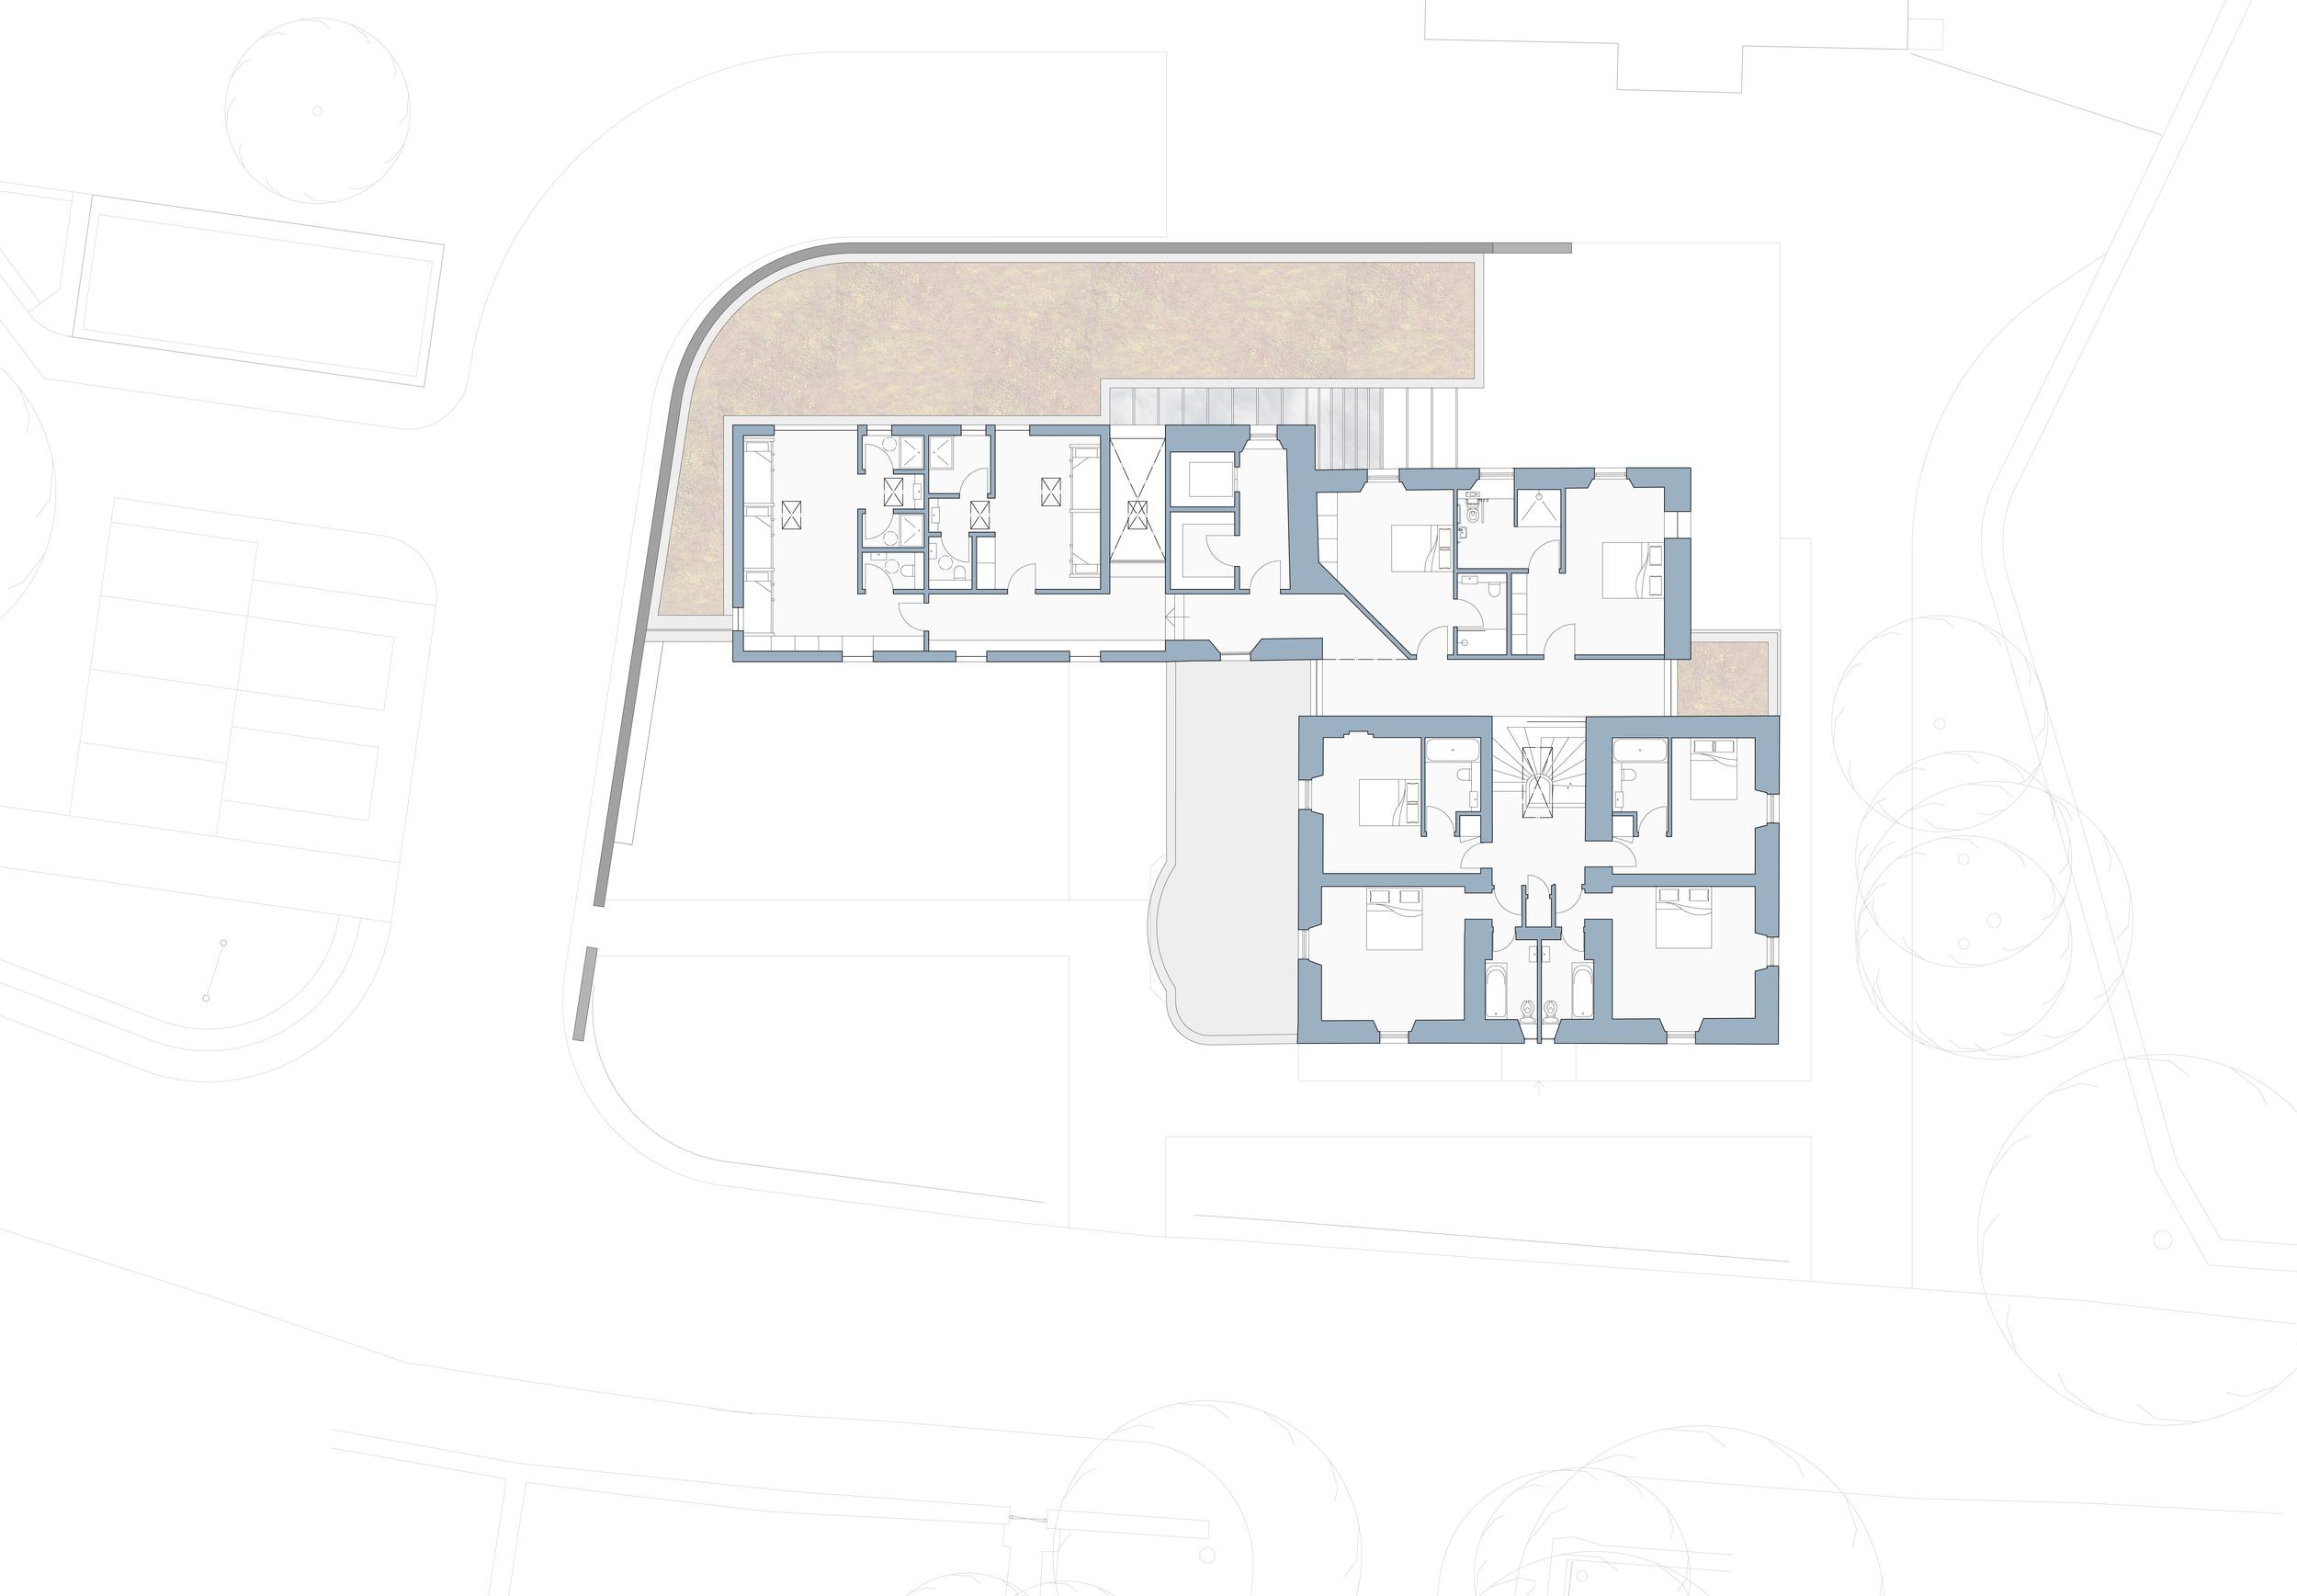 143 1F Plan.jpg